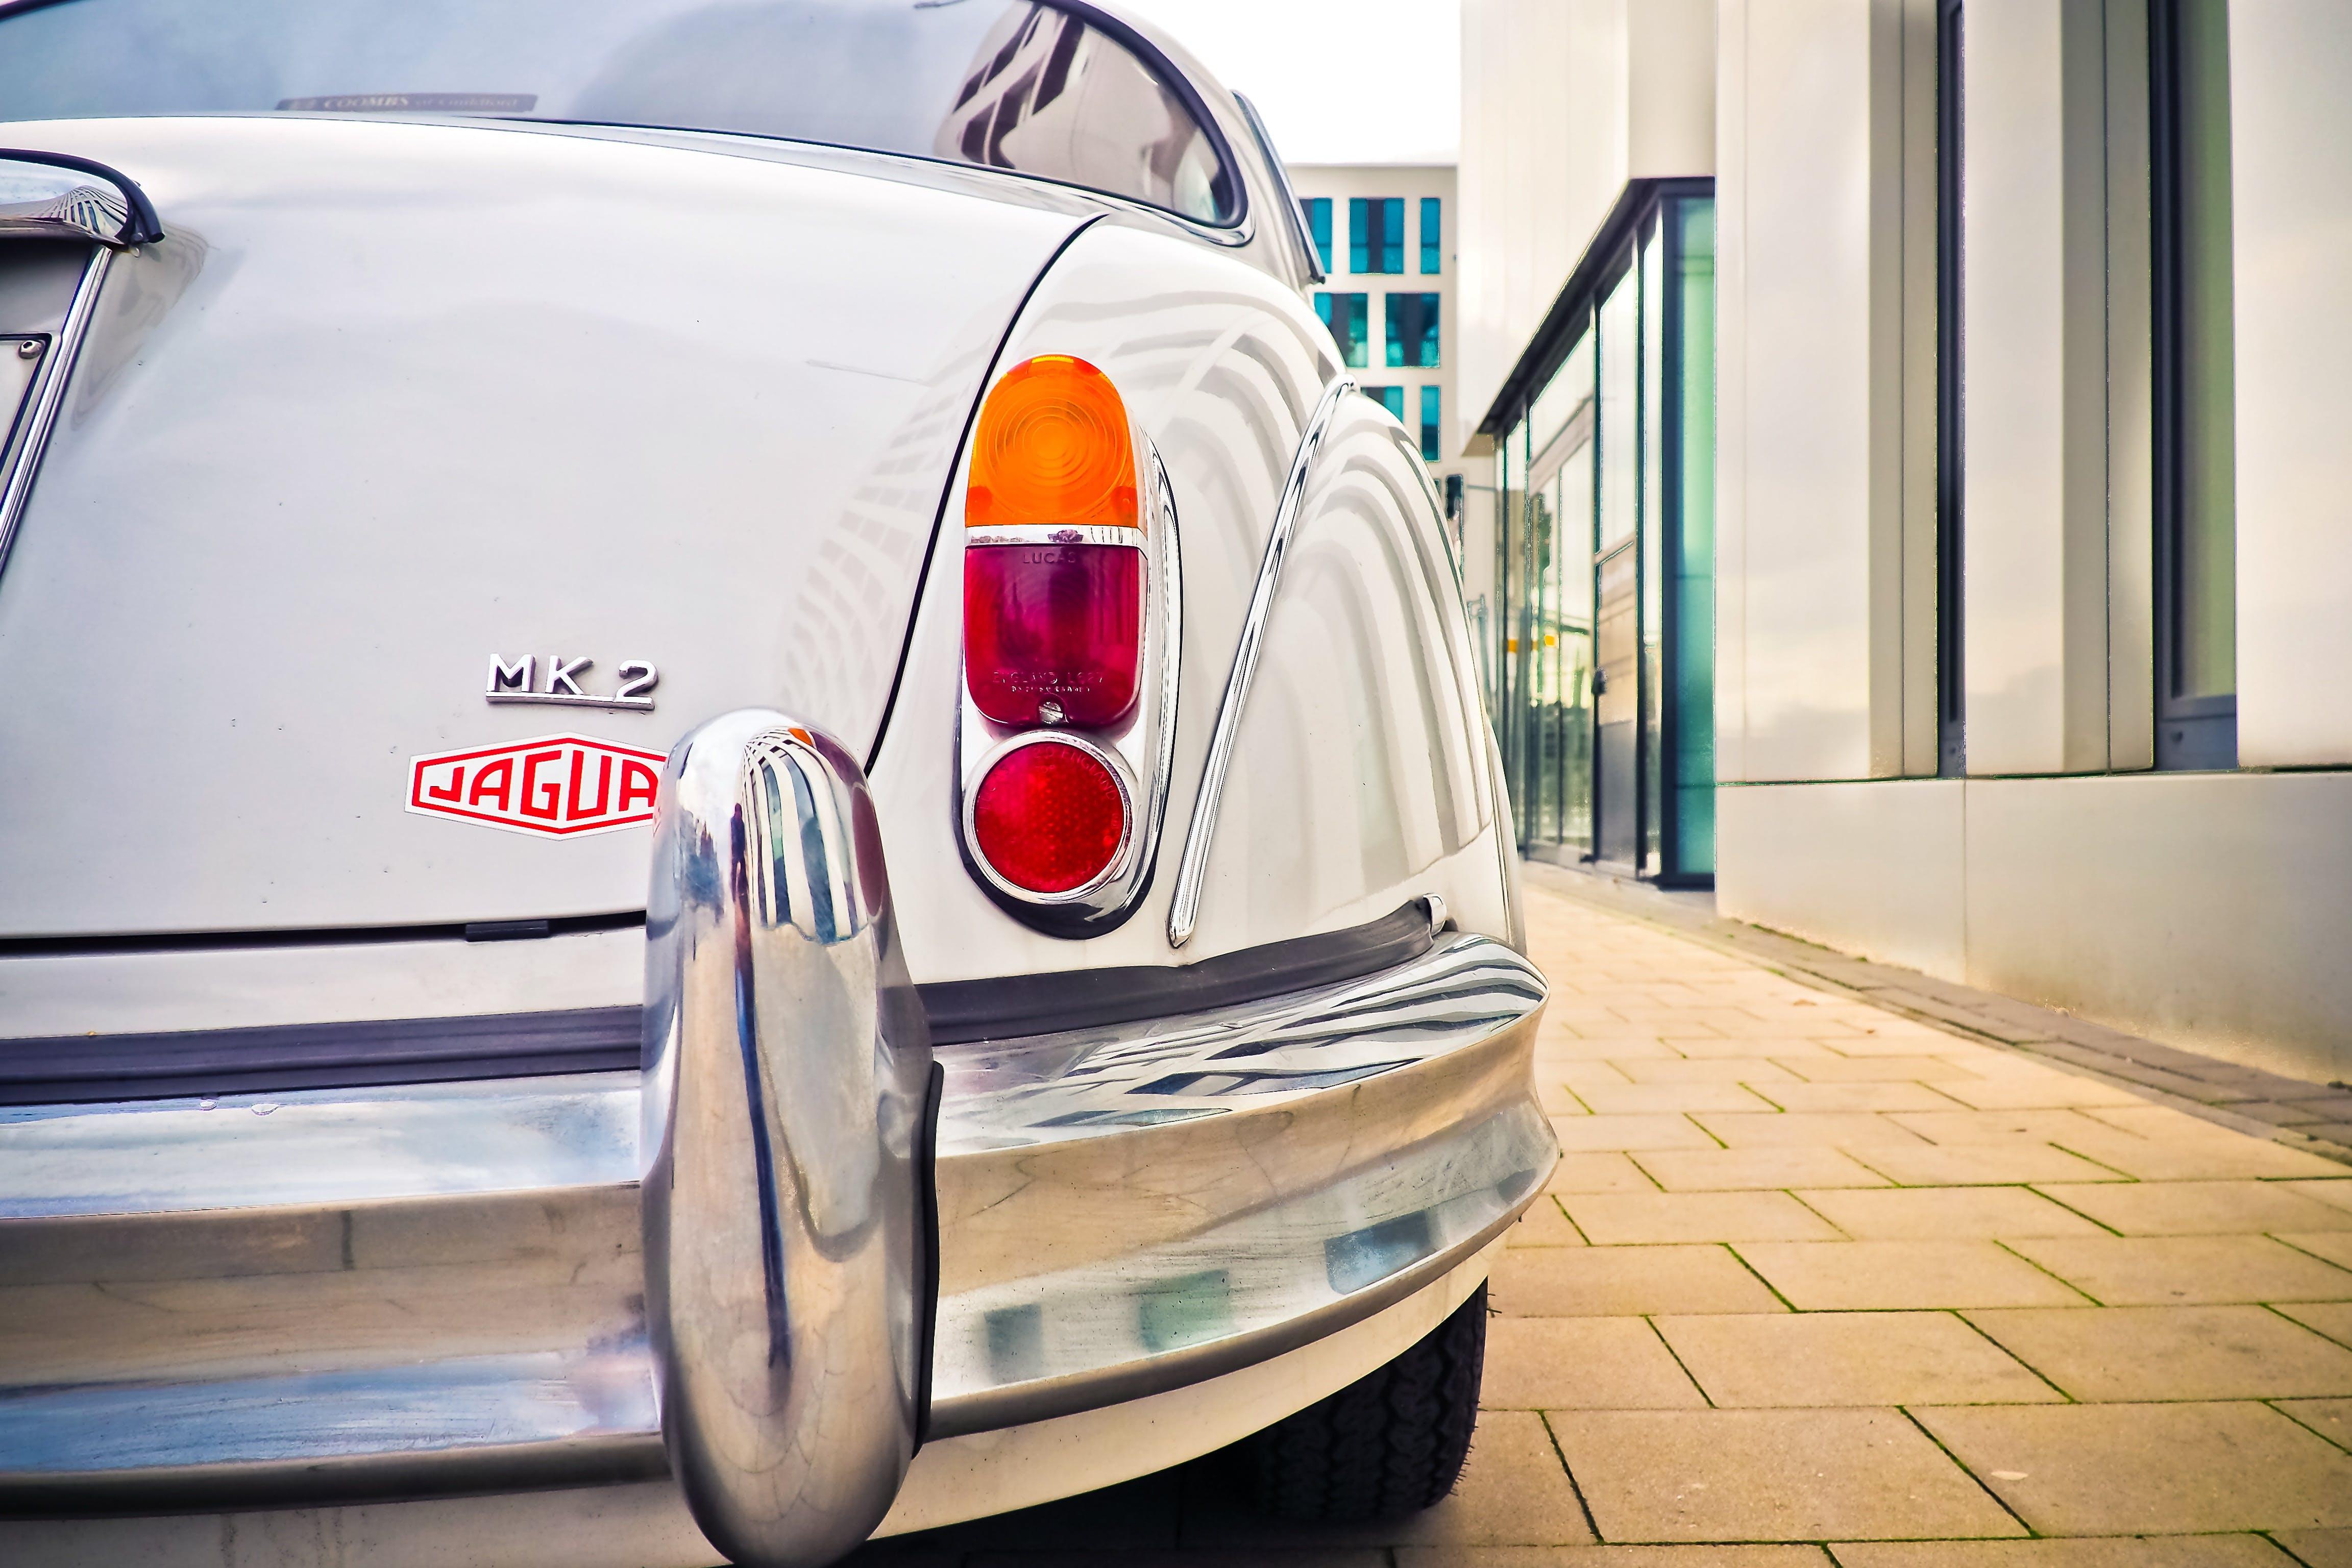 White Jaguar Mk2 Care